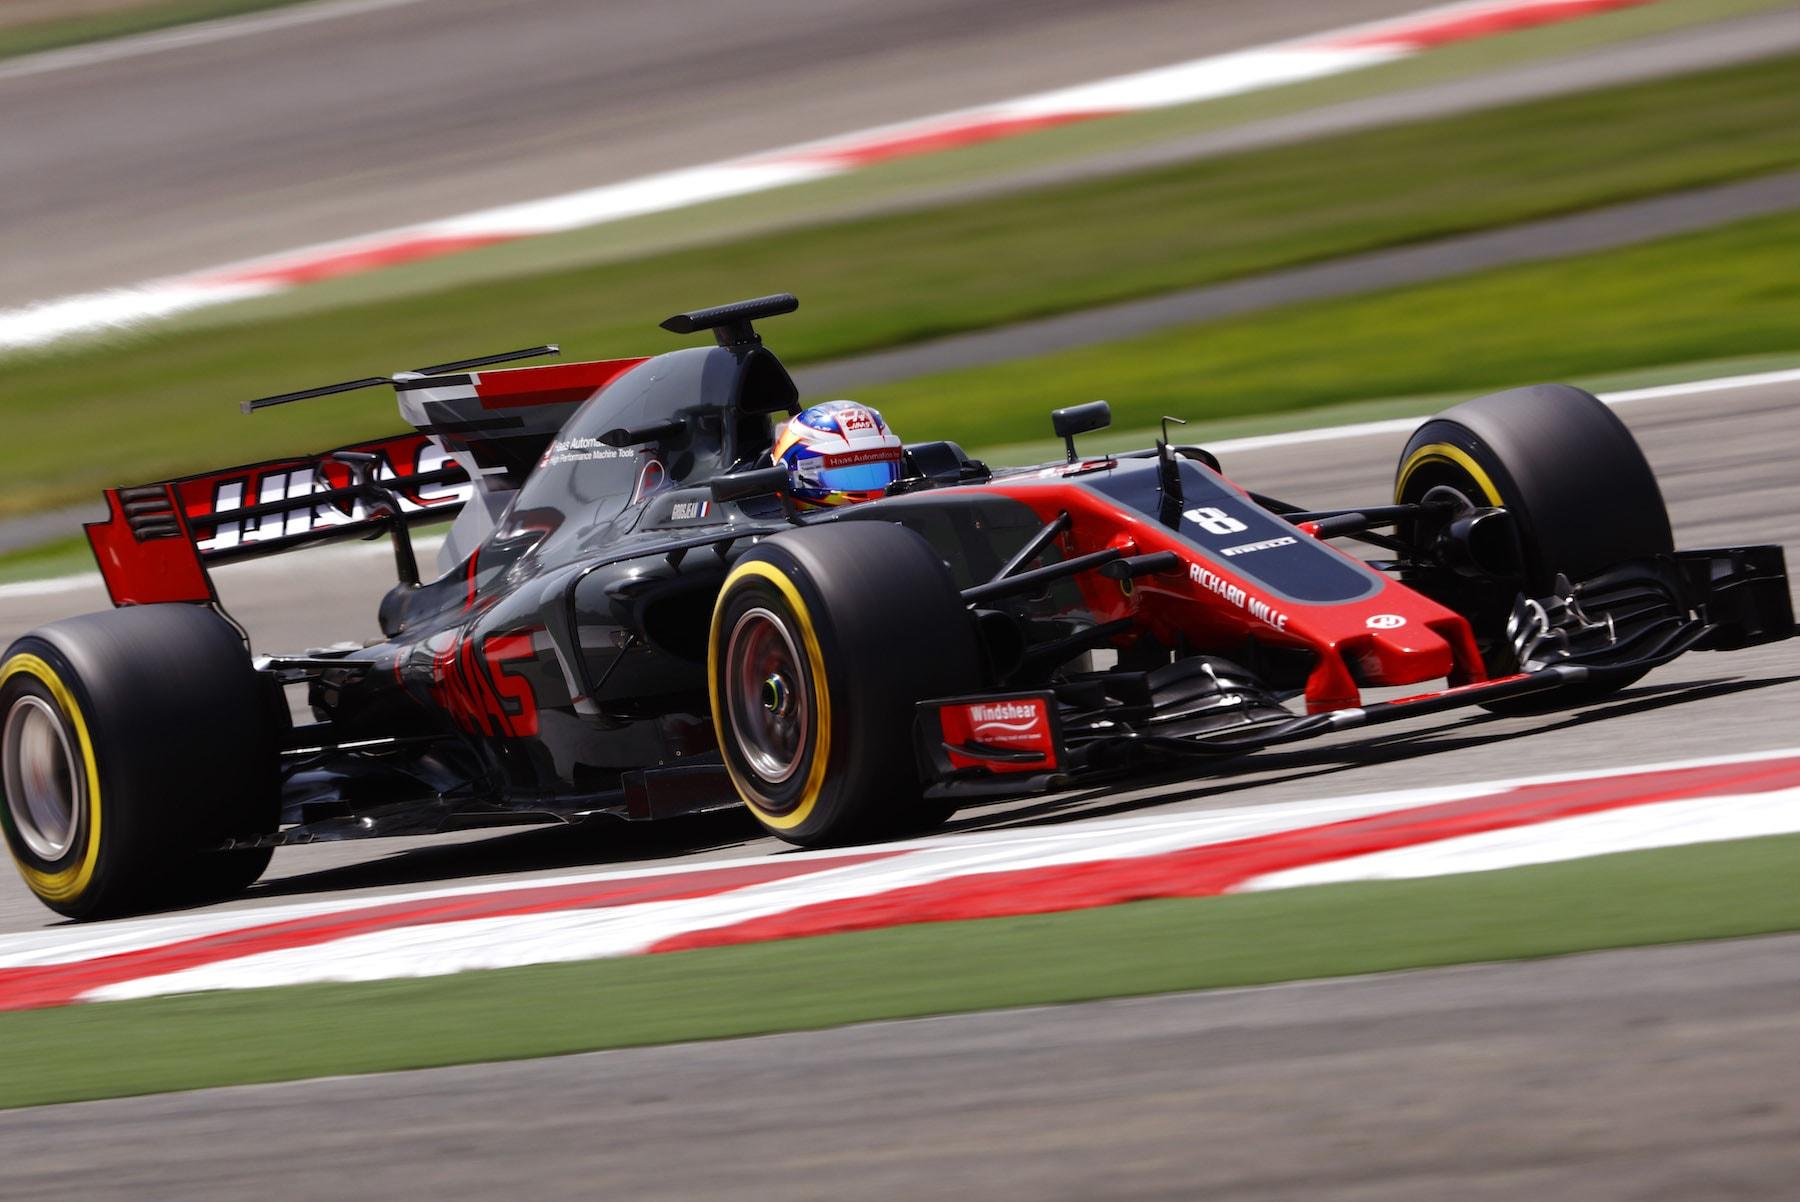 2017 Romain Grosjean | Haas VF17 | 2017 bahrain Test 2 copy.jpg